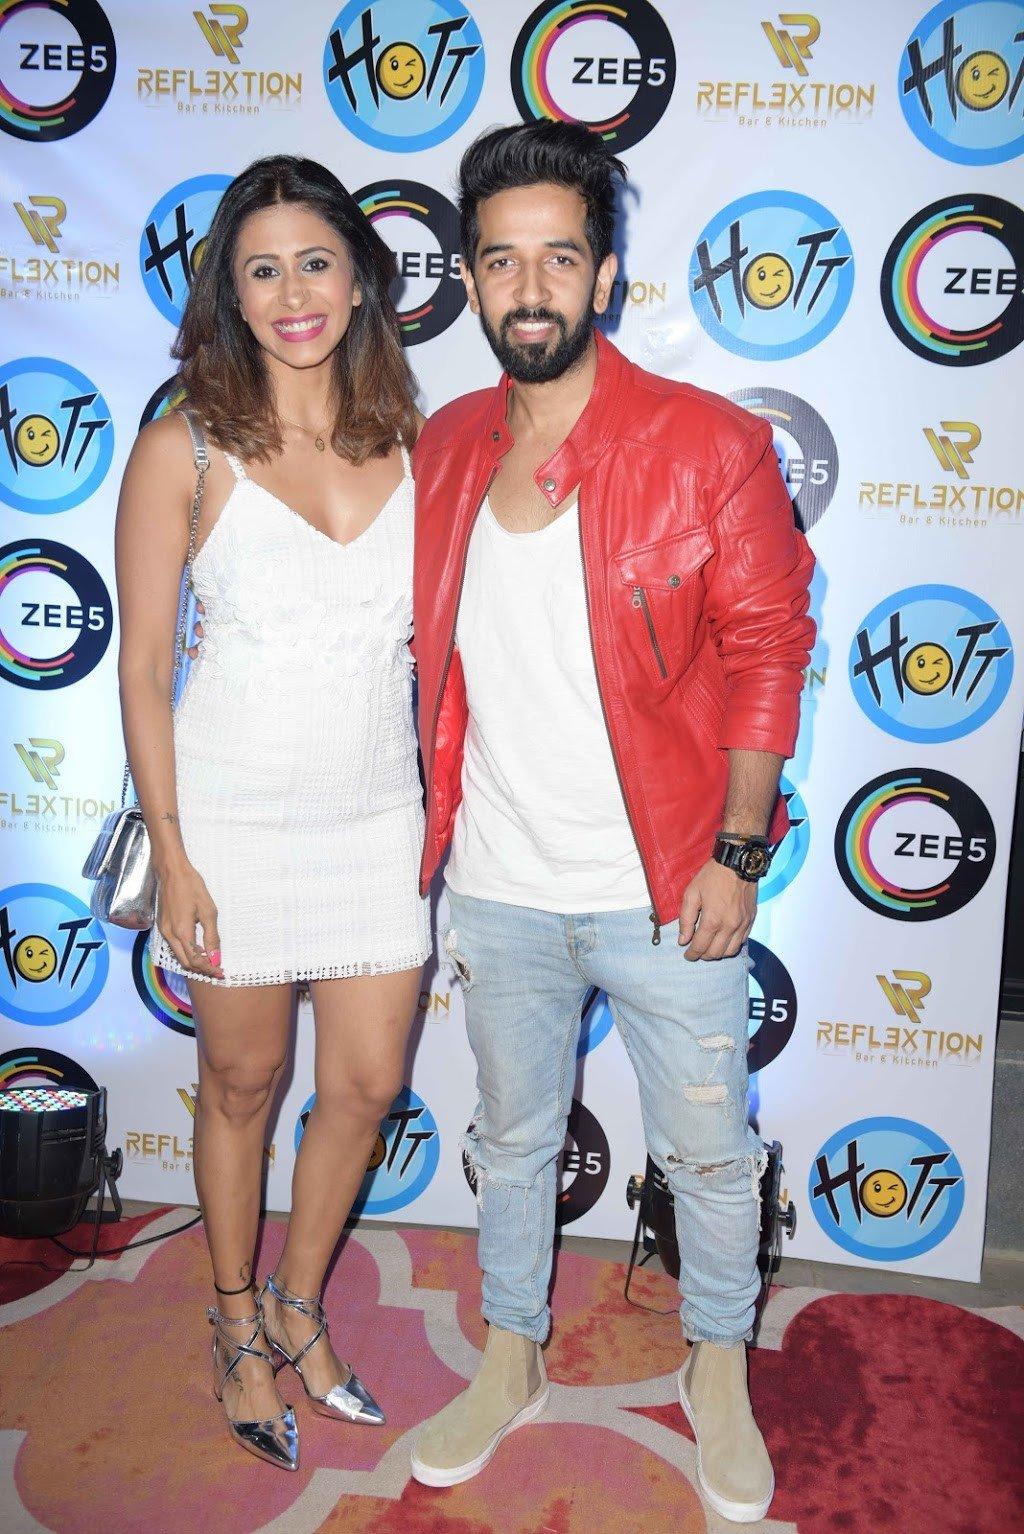 Karan Veer Mehra Hosts A Bash to celebrate Hott Studios' collaboration with Zee5